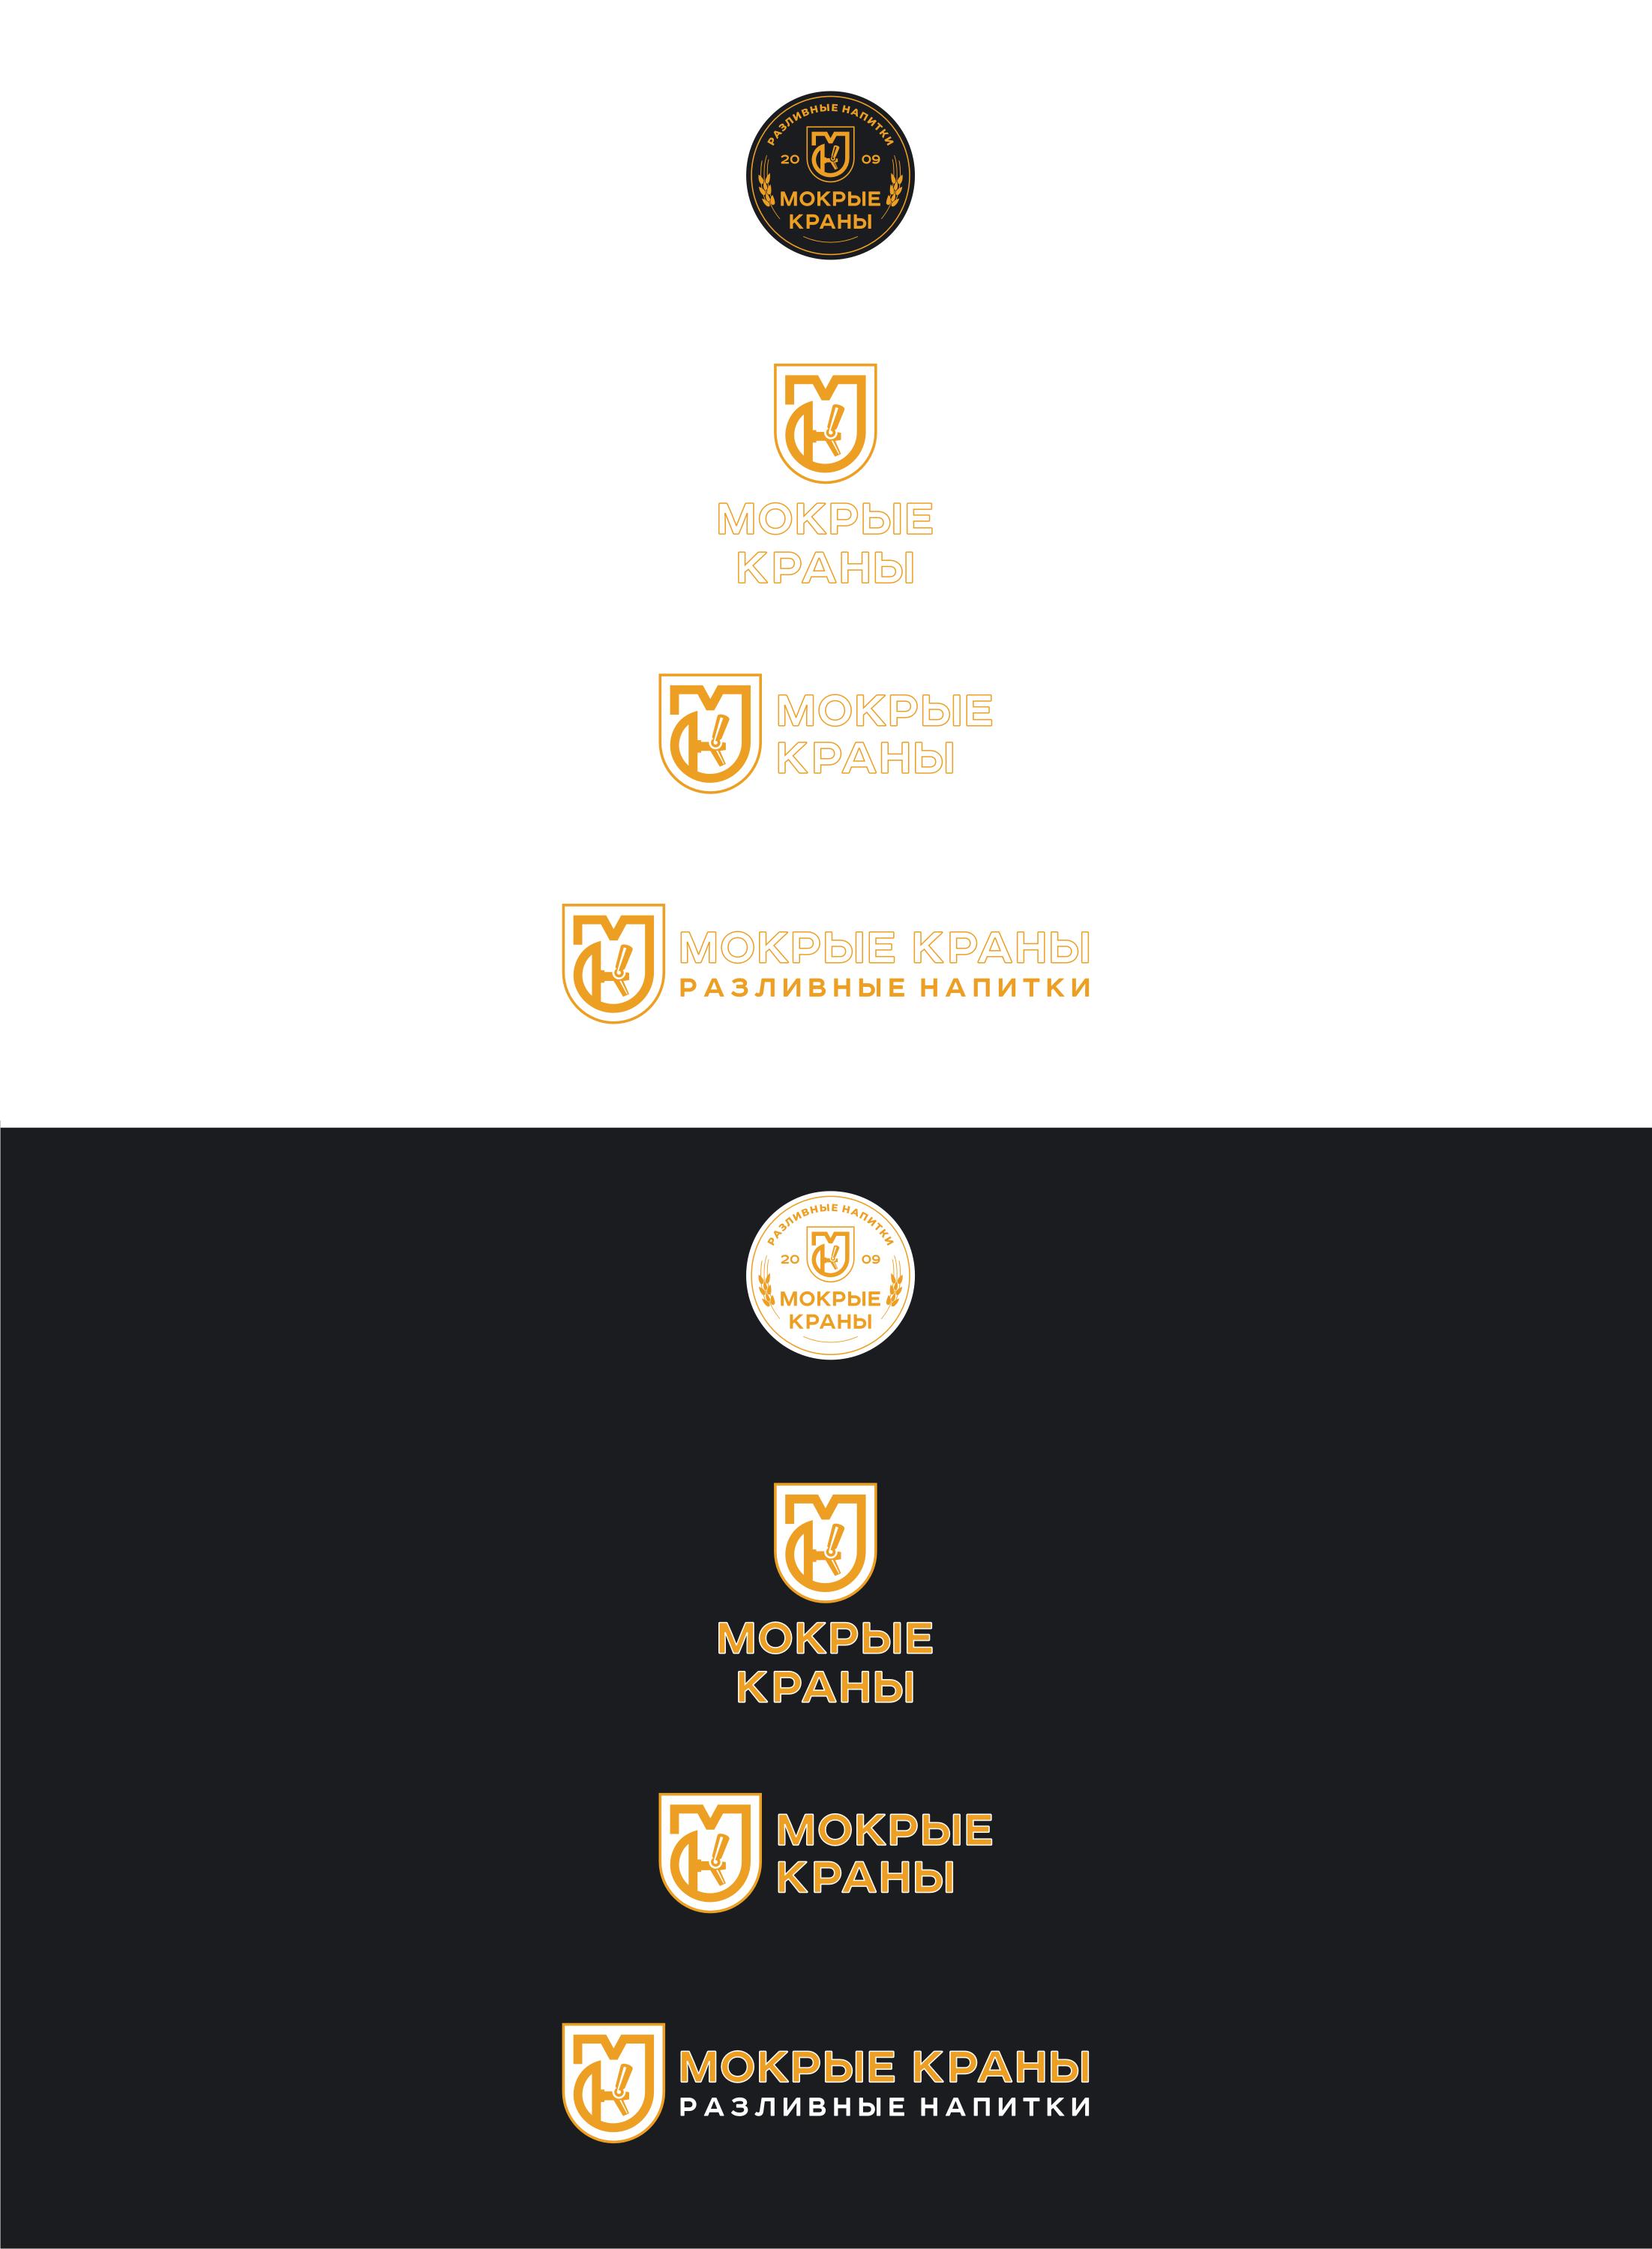 Вывеска/логотип для пивного магазина фото f_523602280a73e8e9.png